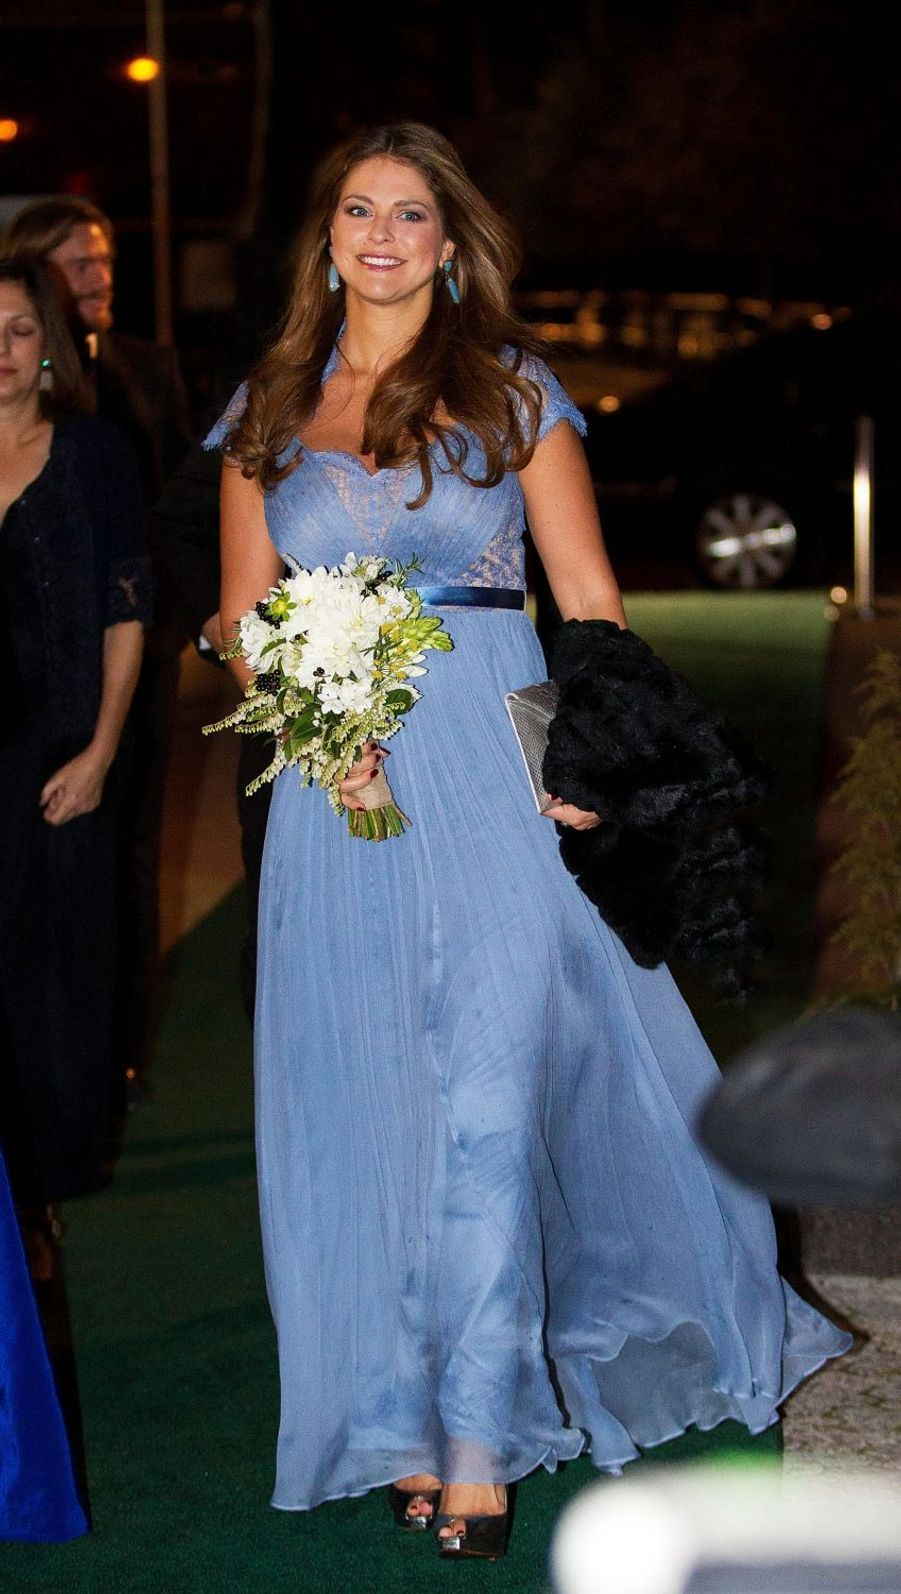 La princesse Madeleine de Suède dans une robe Tadashi Shoji le 23 octobre 2013